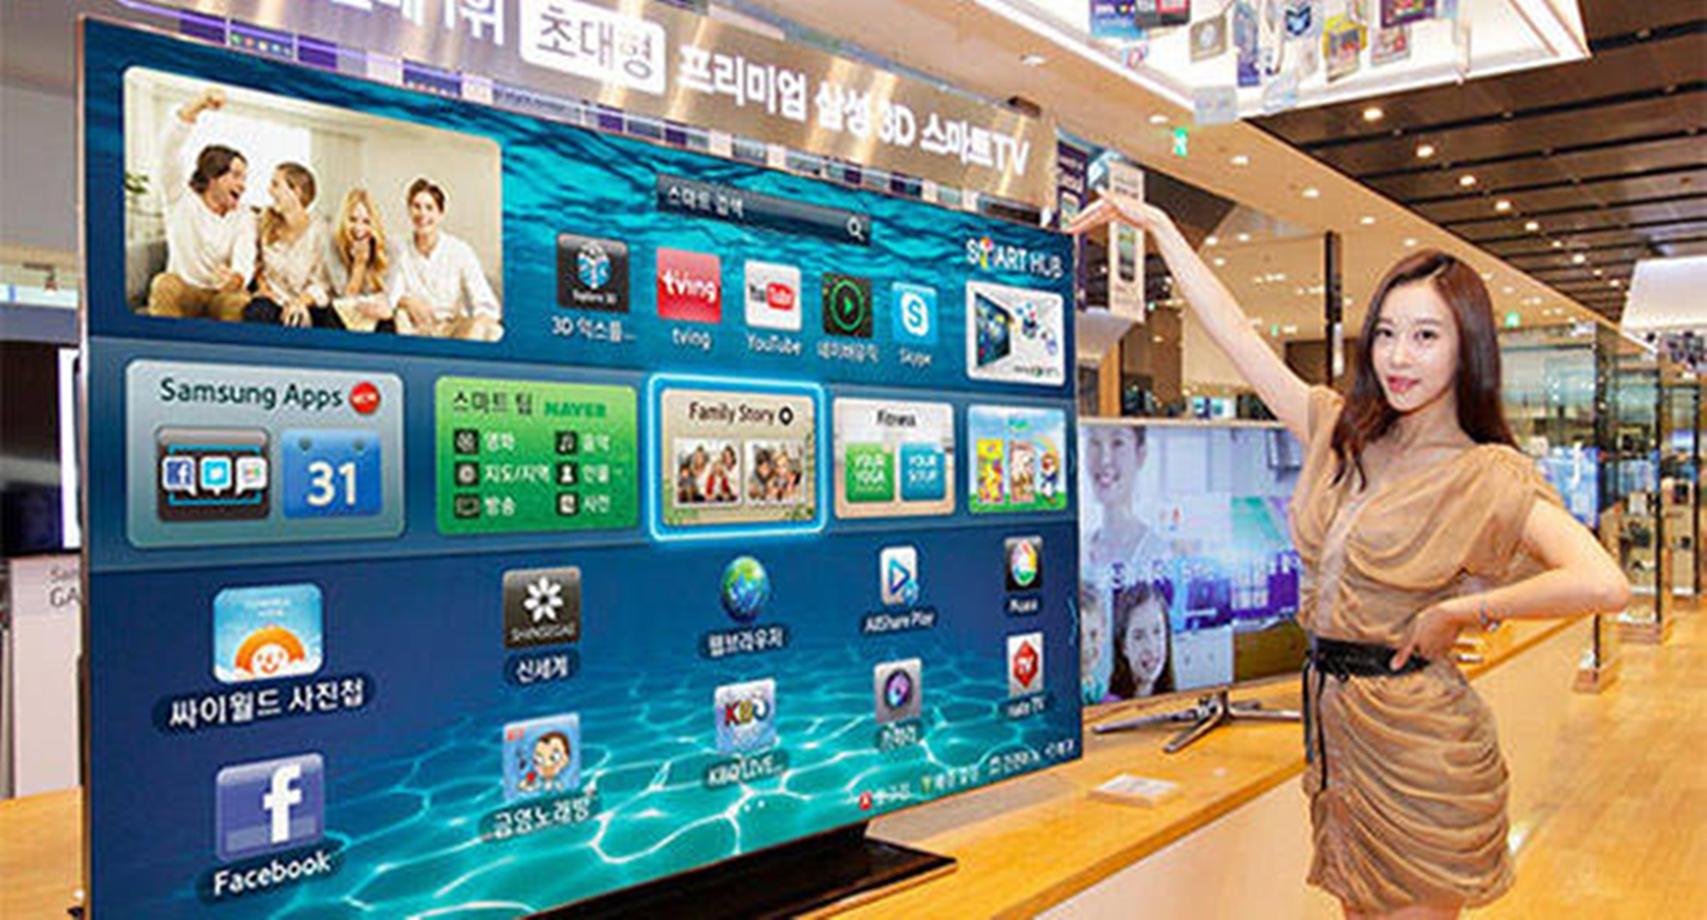 Samsung's 75 inch TV